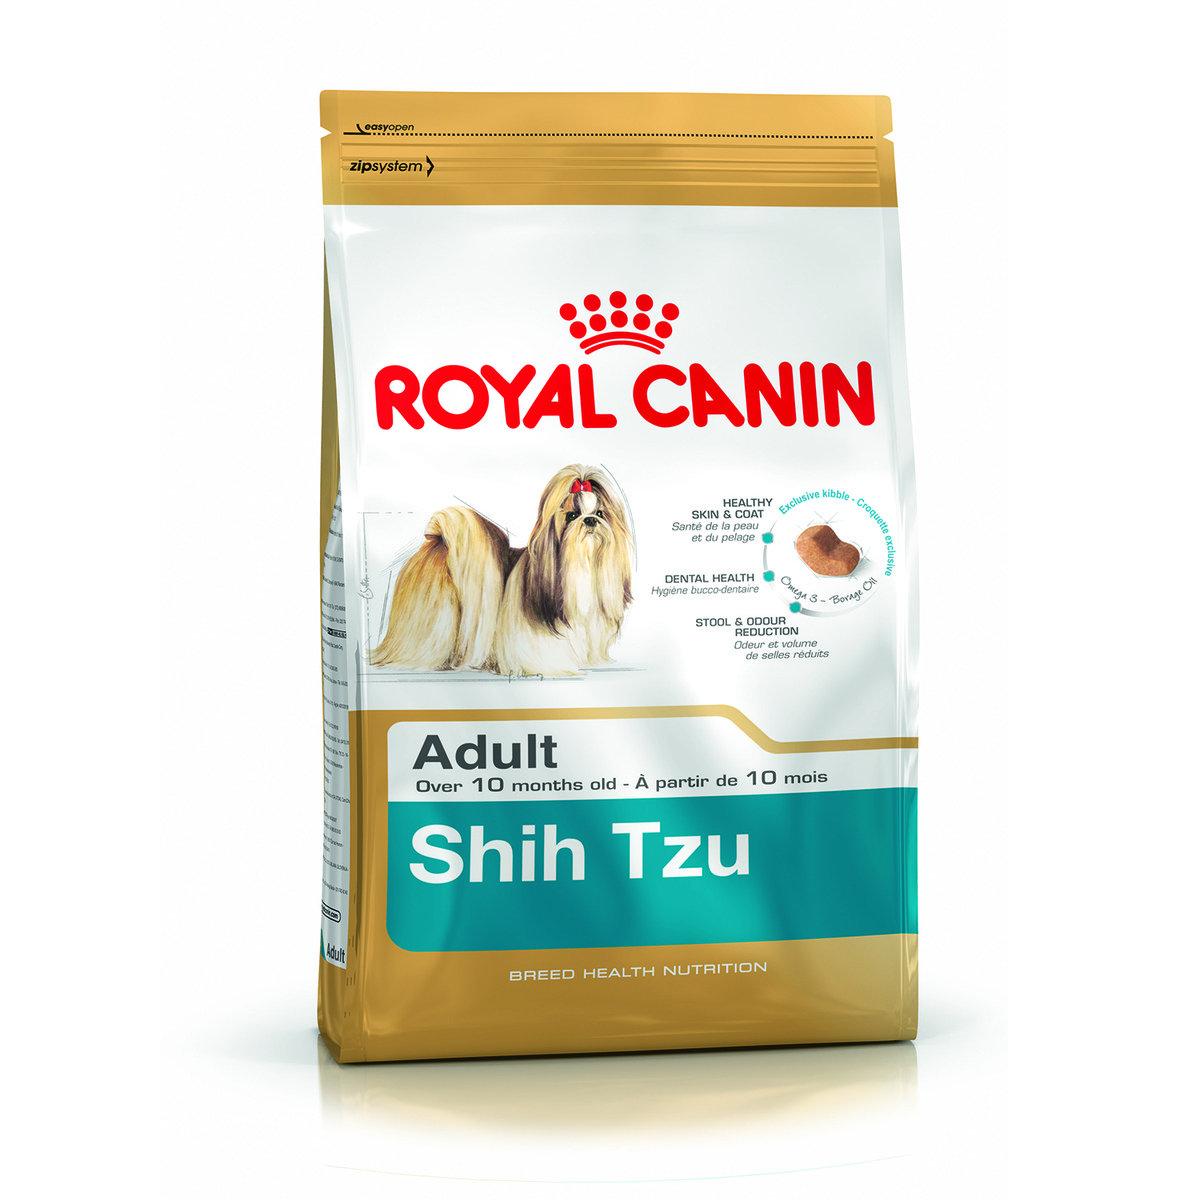 Shih Tzu 24 西施配方 (SHT24)